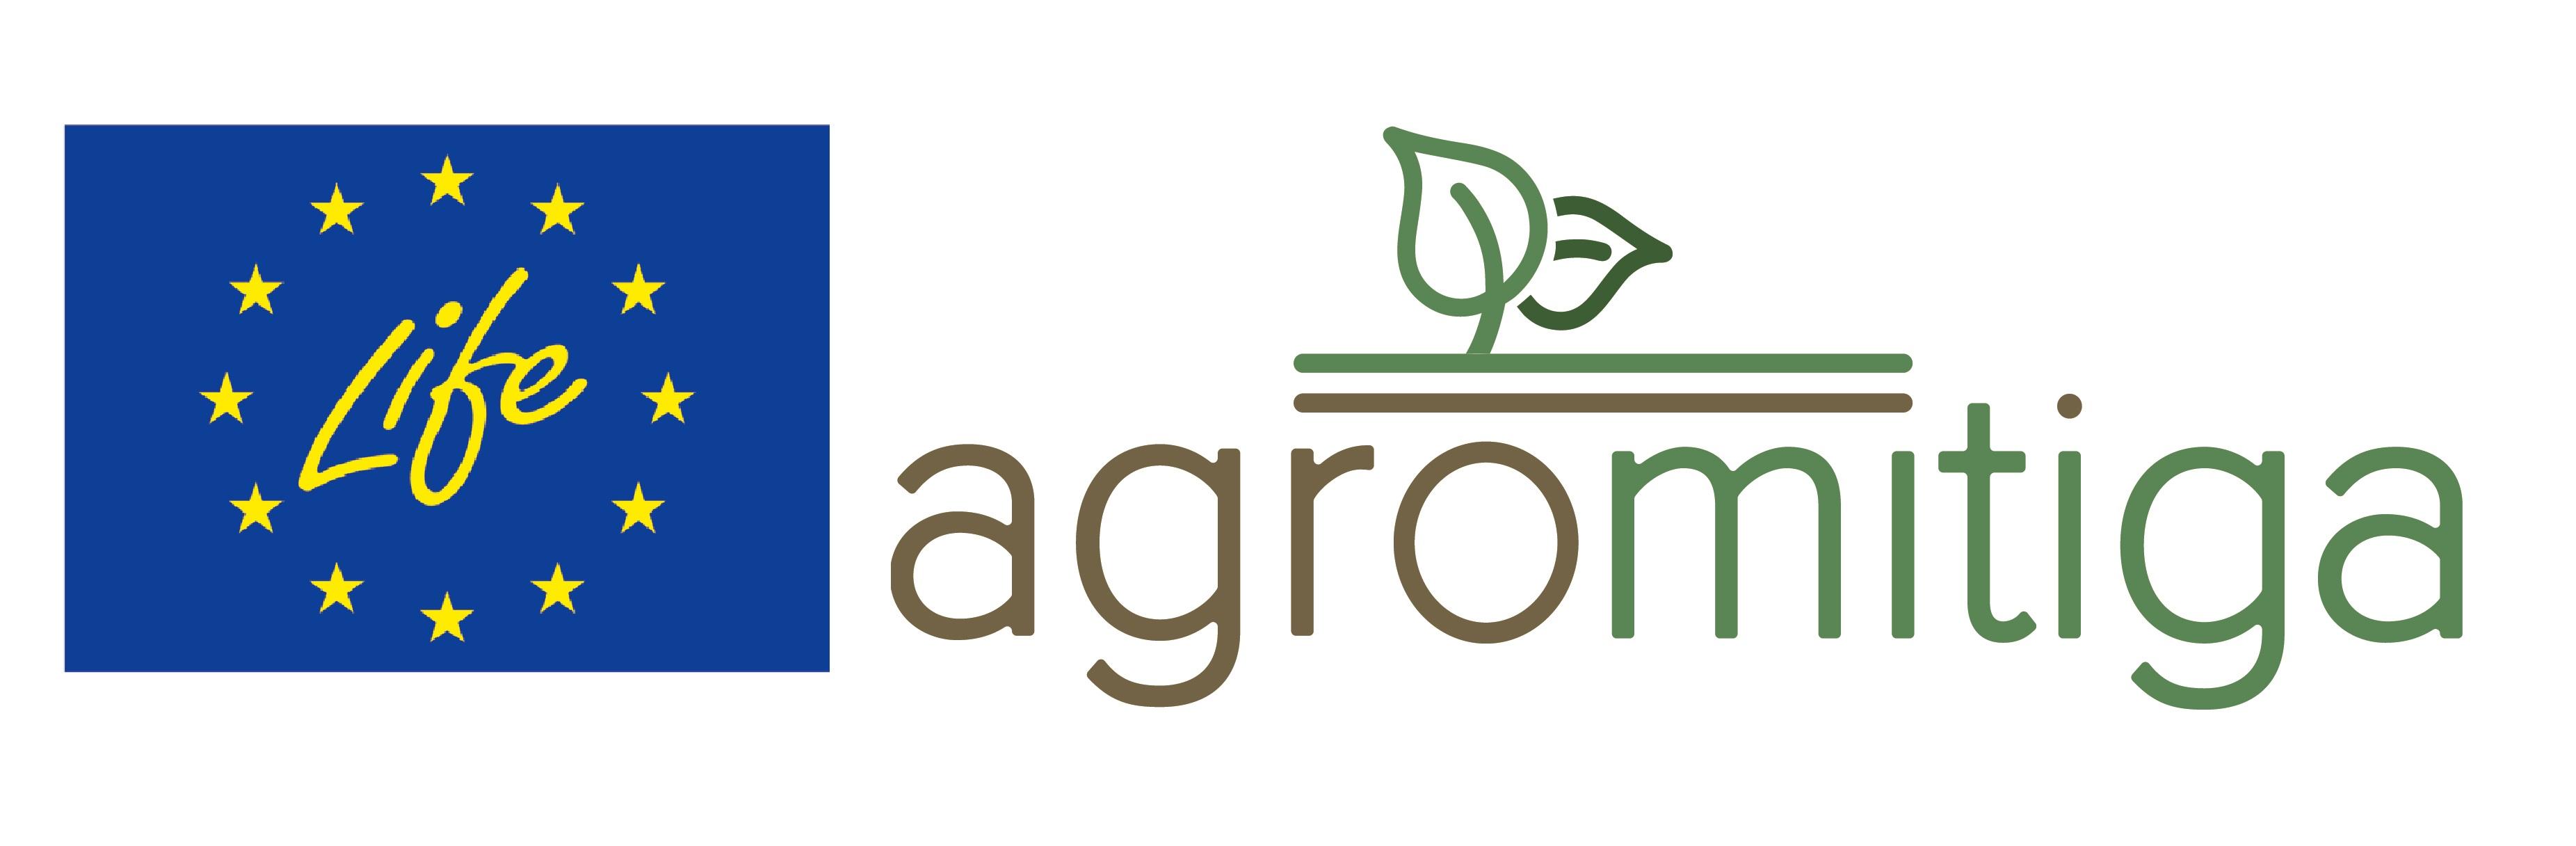 agromitiga logo_Prinicpal